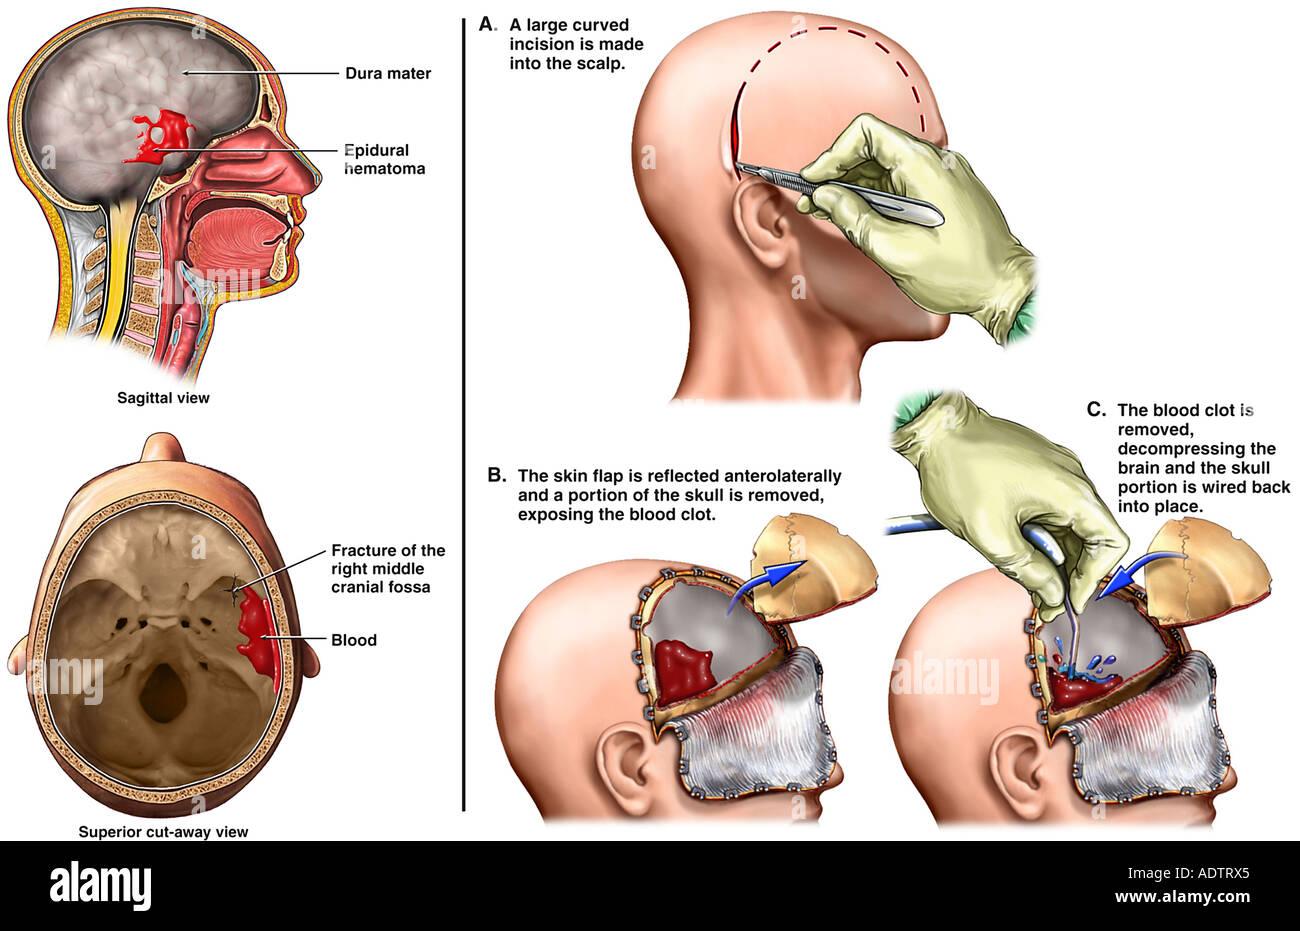 Enchanting Jaw Wired Shut Surgery Vignette - Wiring Schematics and ...